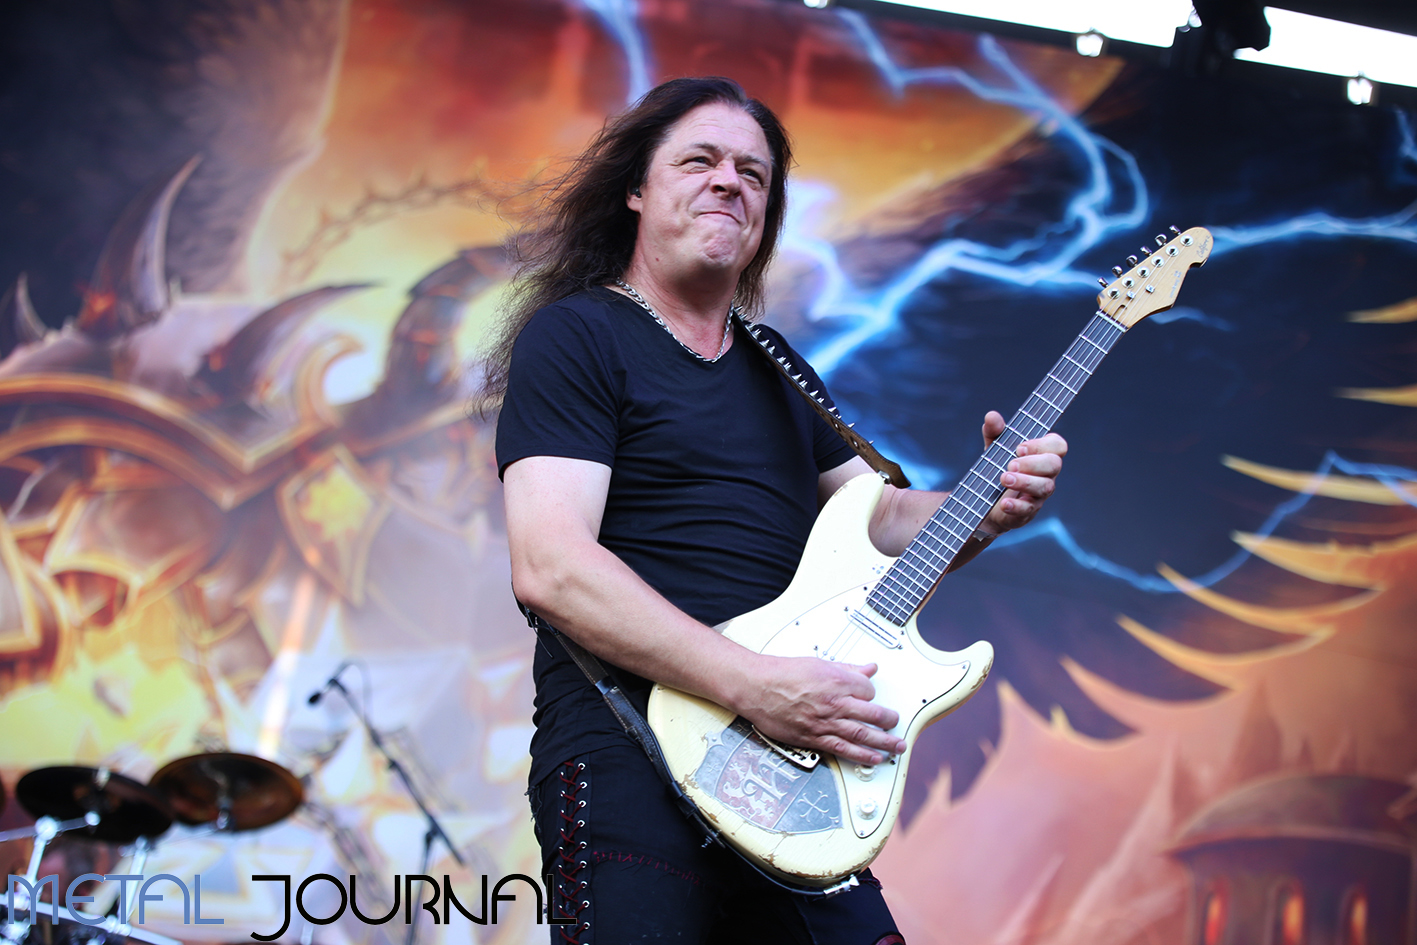 hammerfall - leyendas del rock 2019 metal journal pic 4